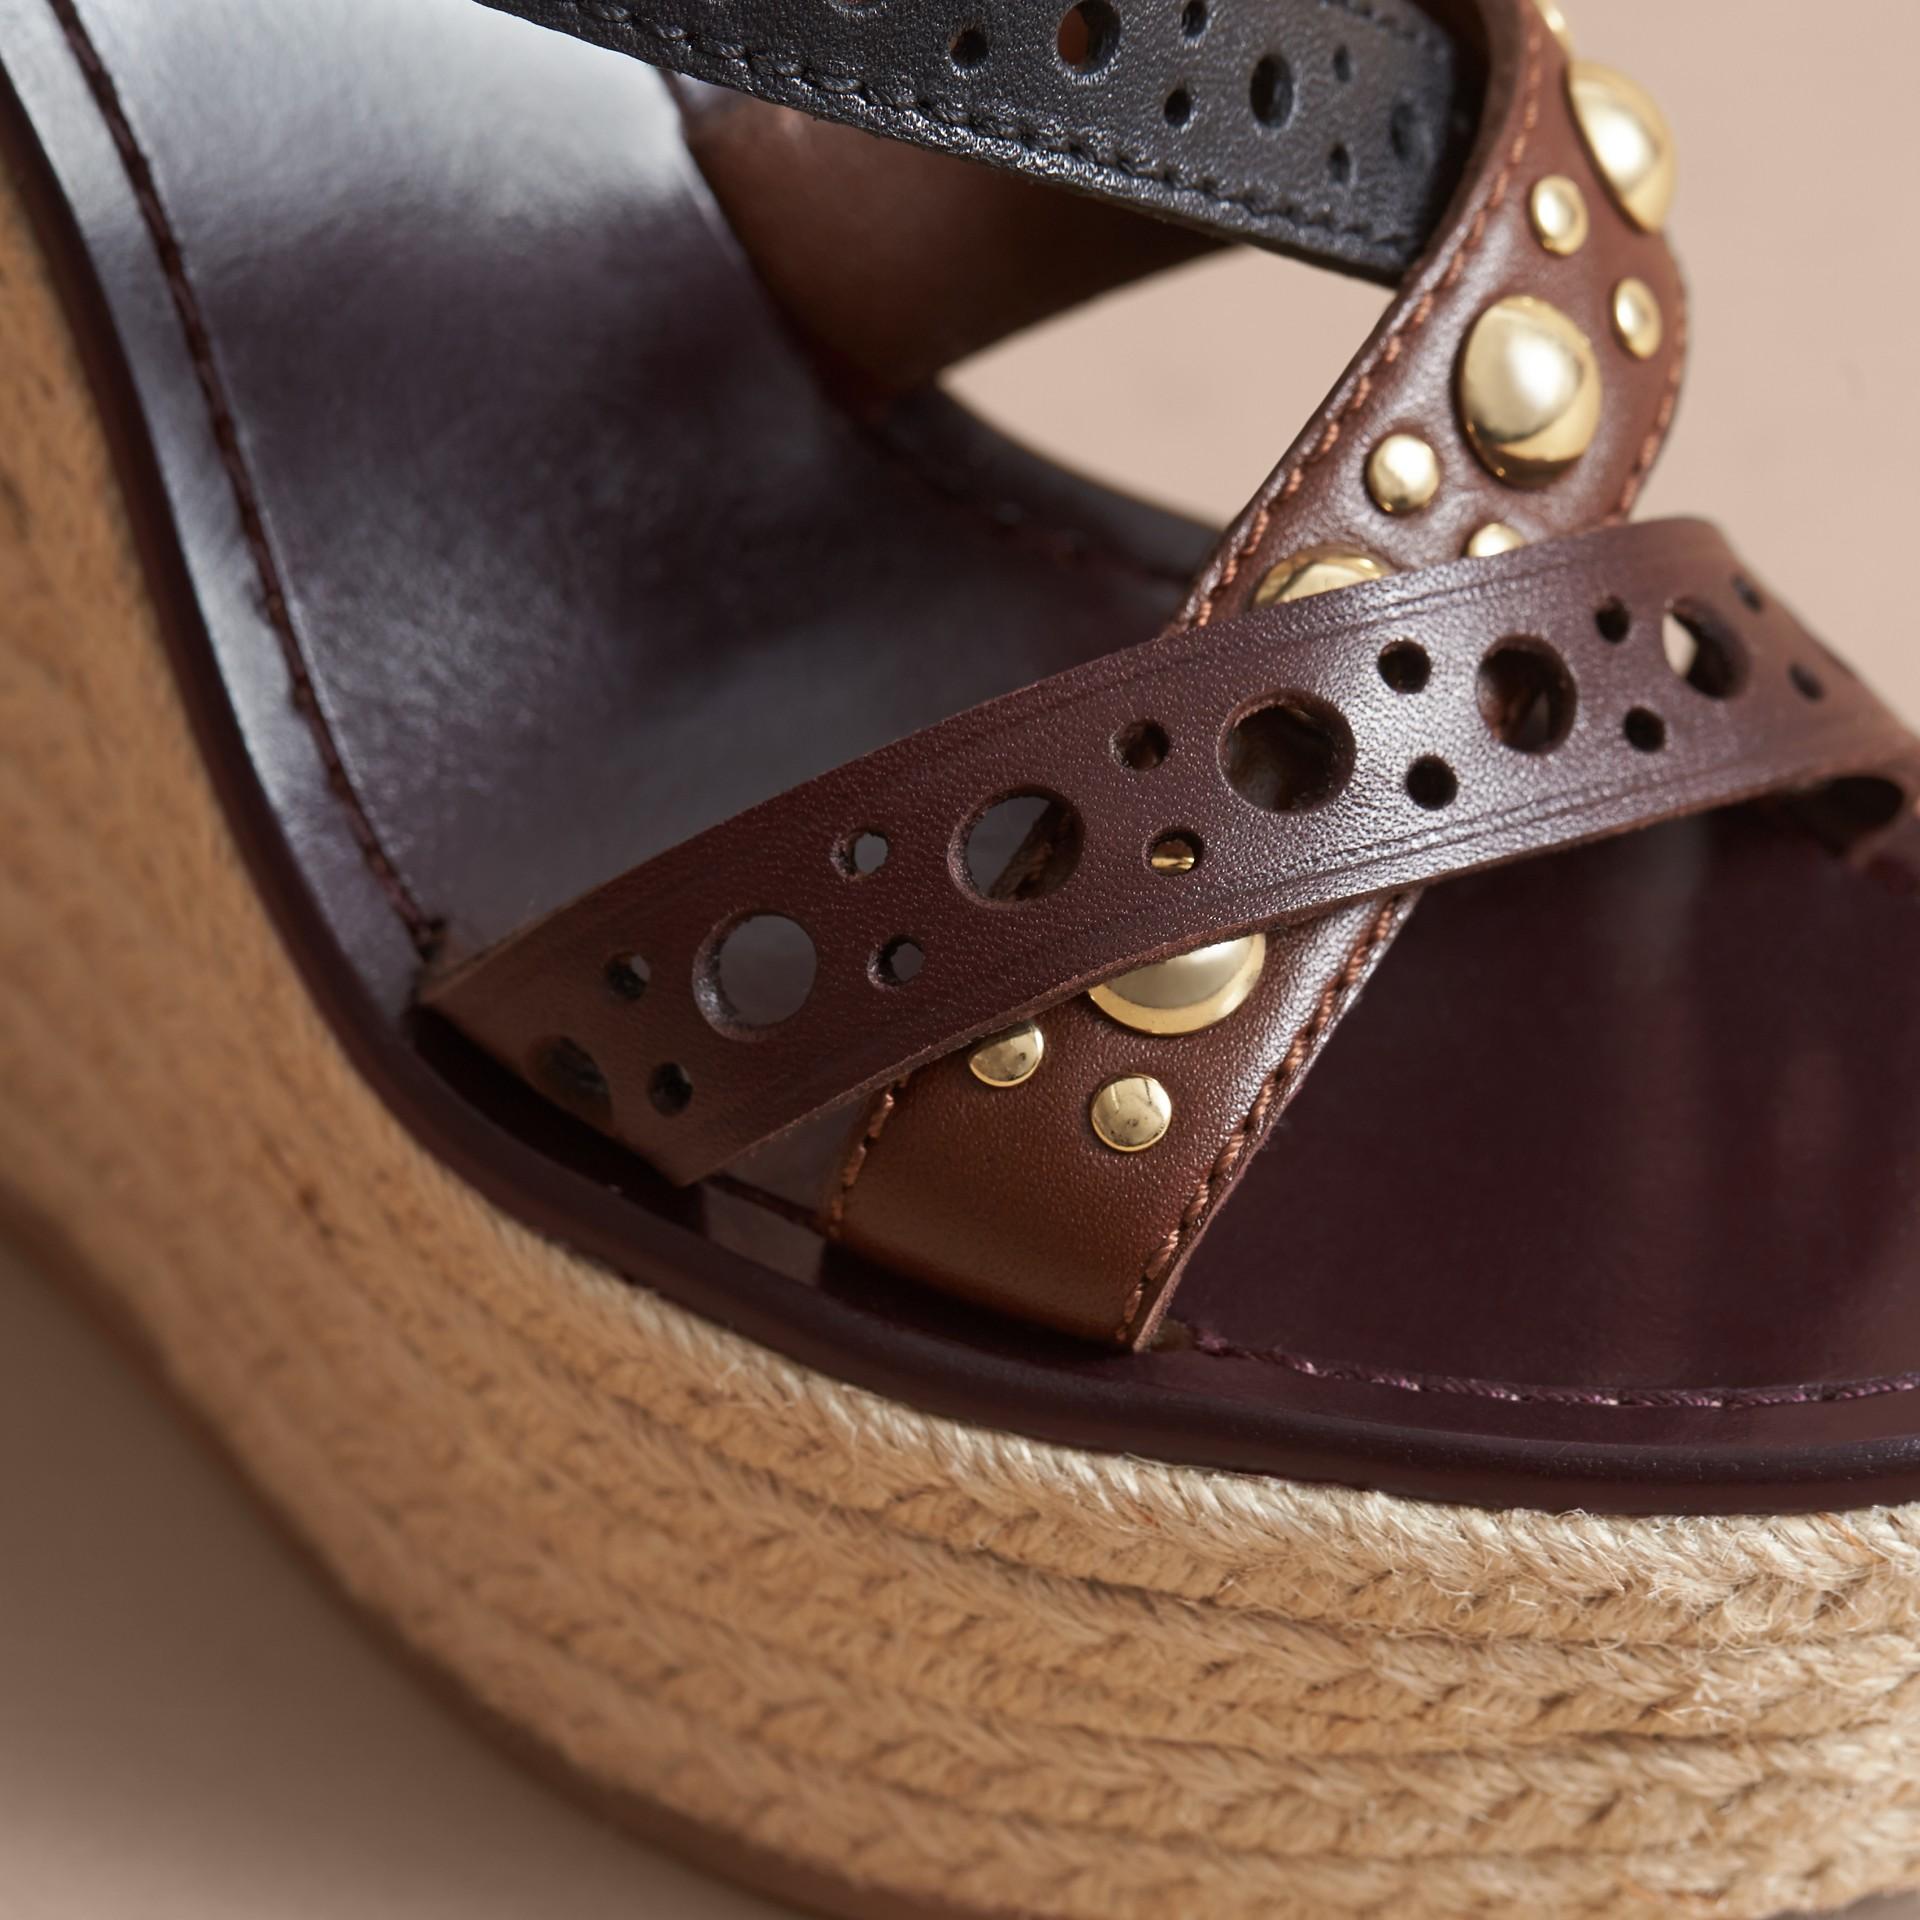 Riveted Leather Platform Espadrille Wedge Sandals - gallery image 5